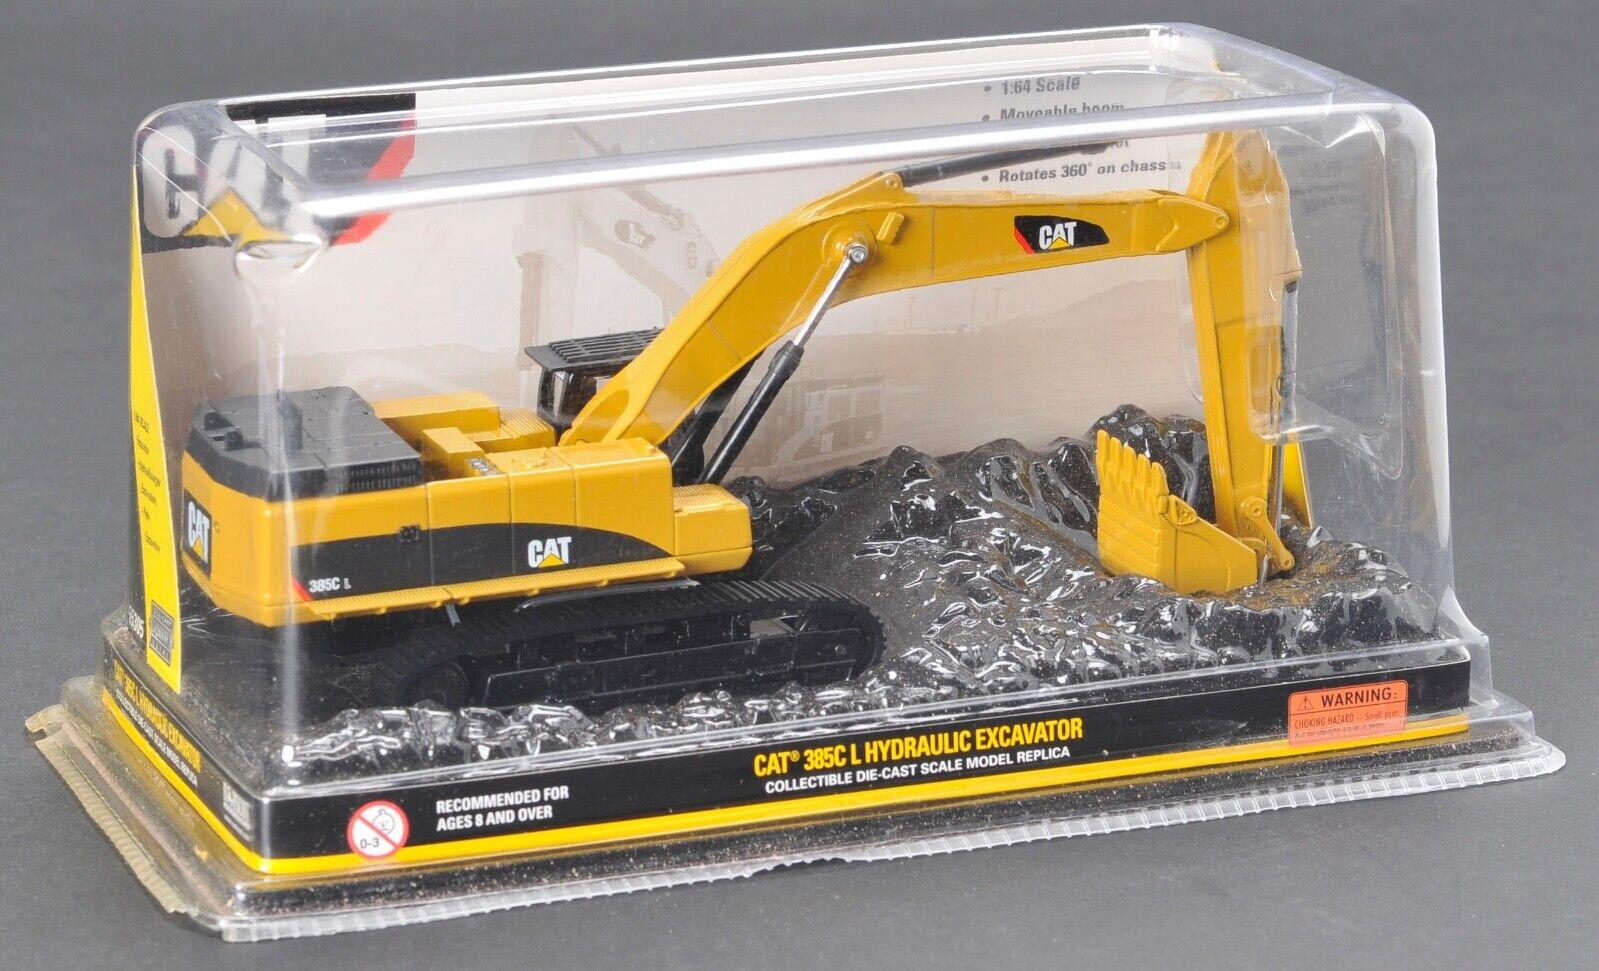 Norscot CAT 385C L Hydraulic Excavator Die Cast 1 64 Scale New 2007